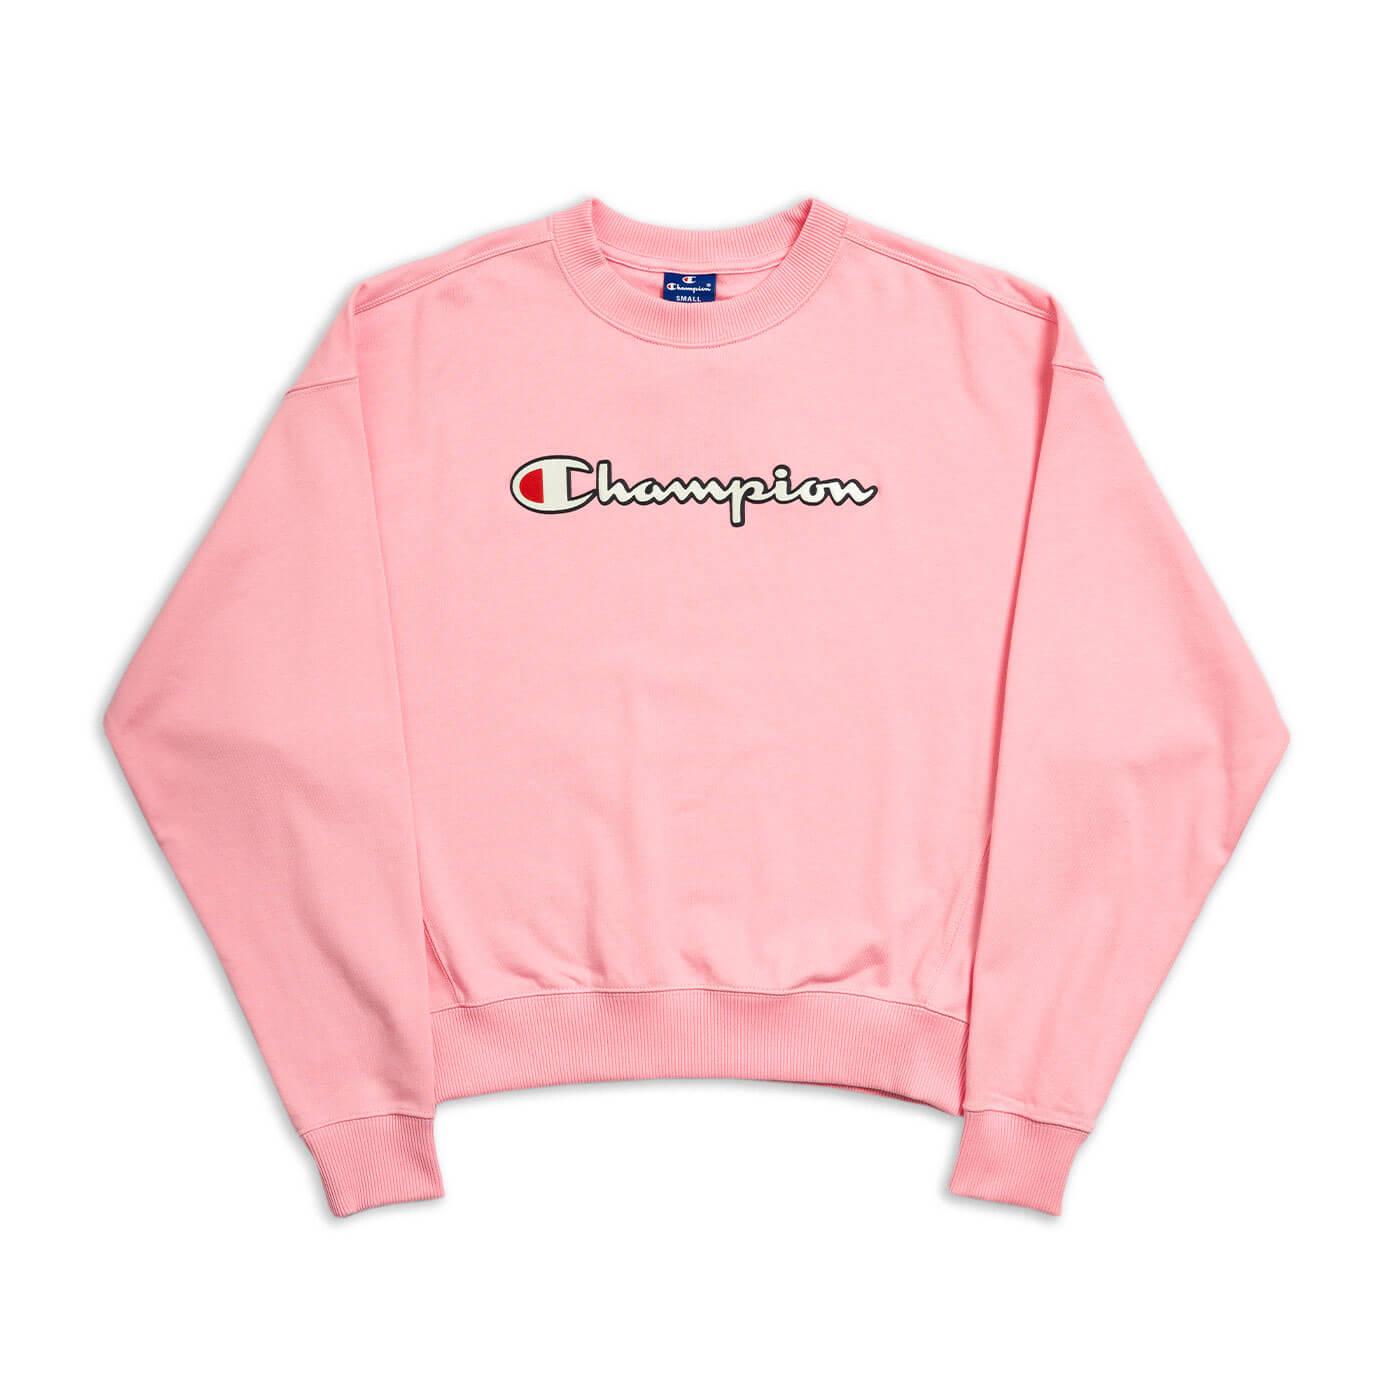 camisola de rapariga champion cor de rosa